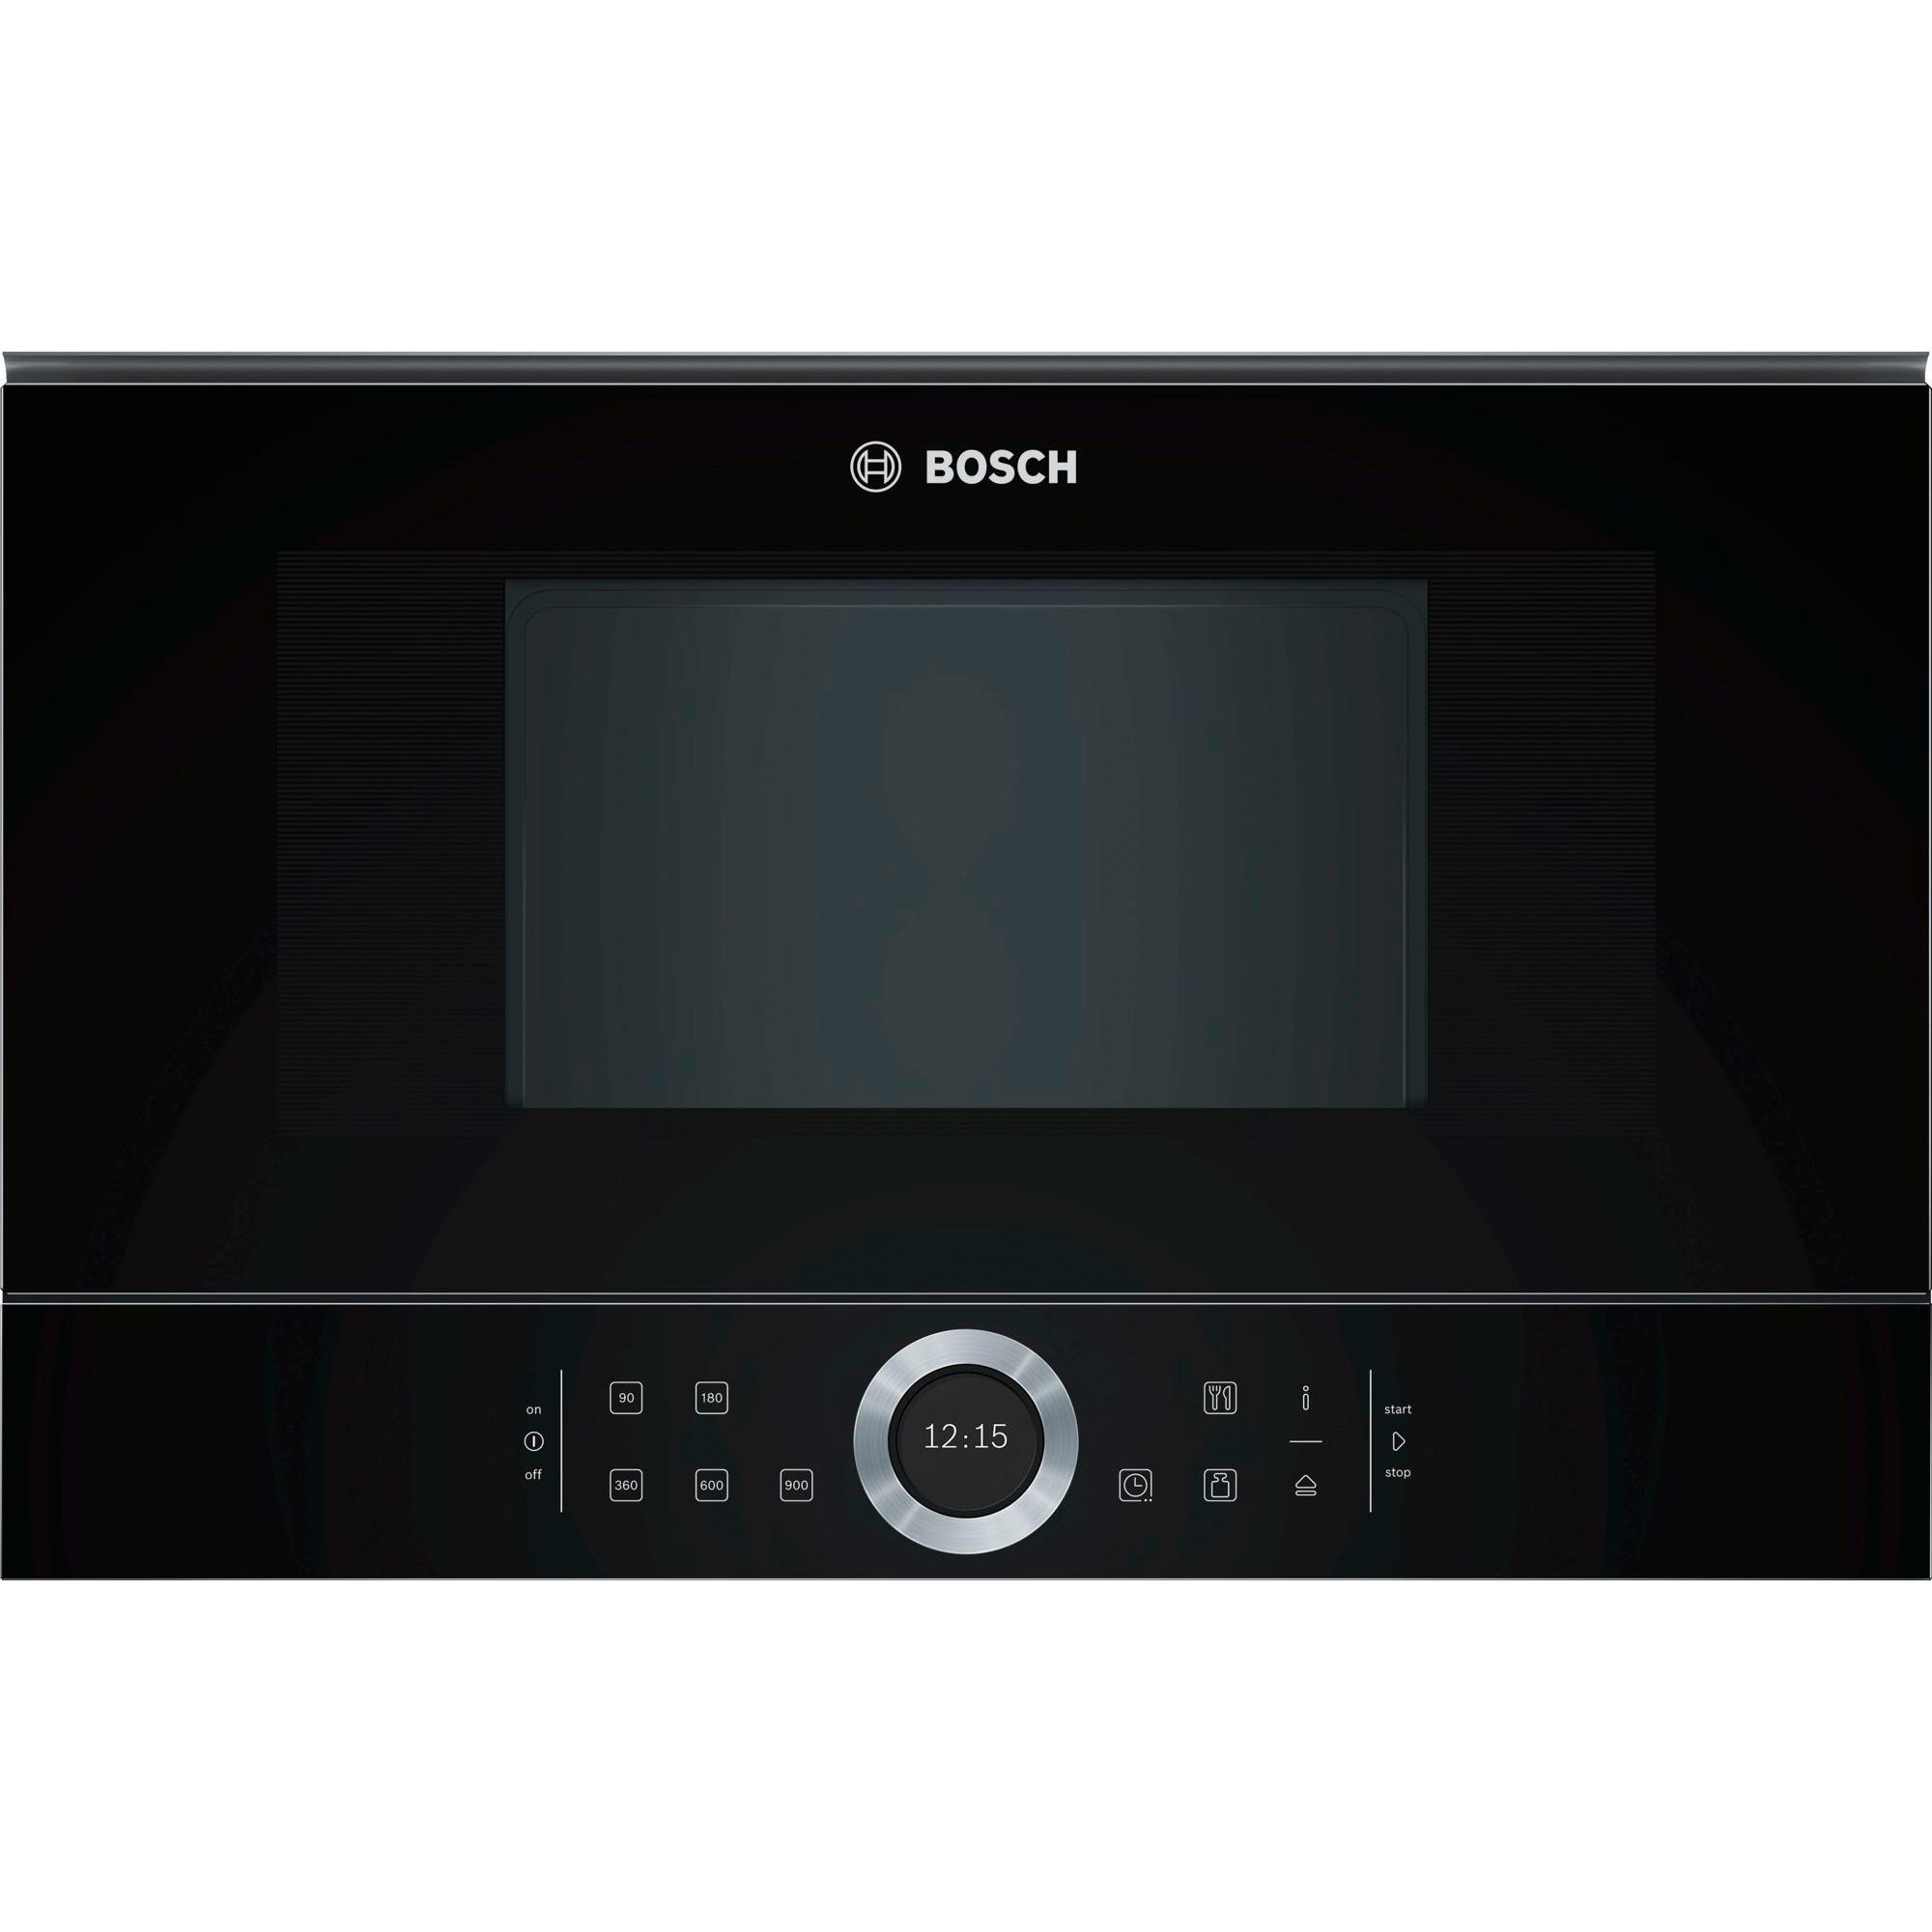 BFL634GB1 Intégré 21L 900W Noir micro-onde, Four à micro-ondes